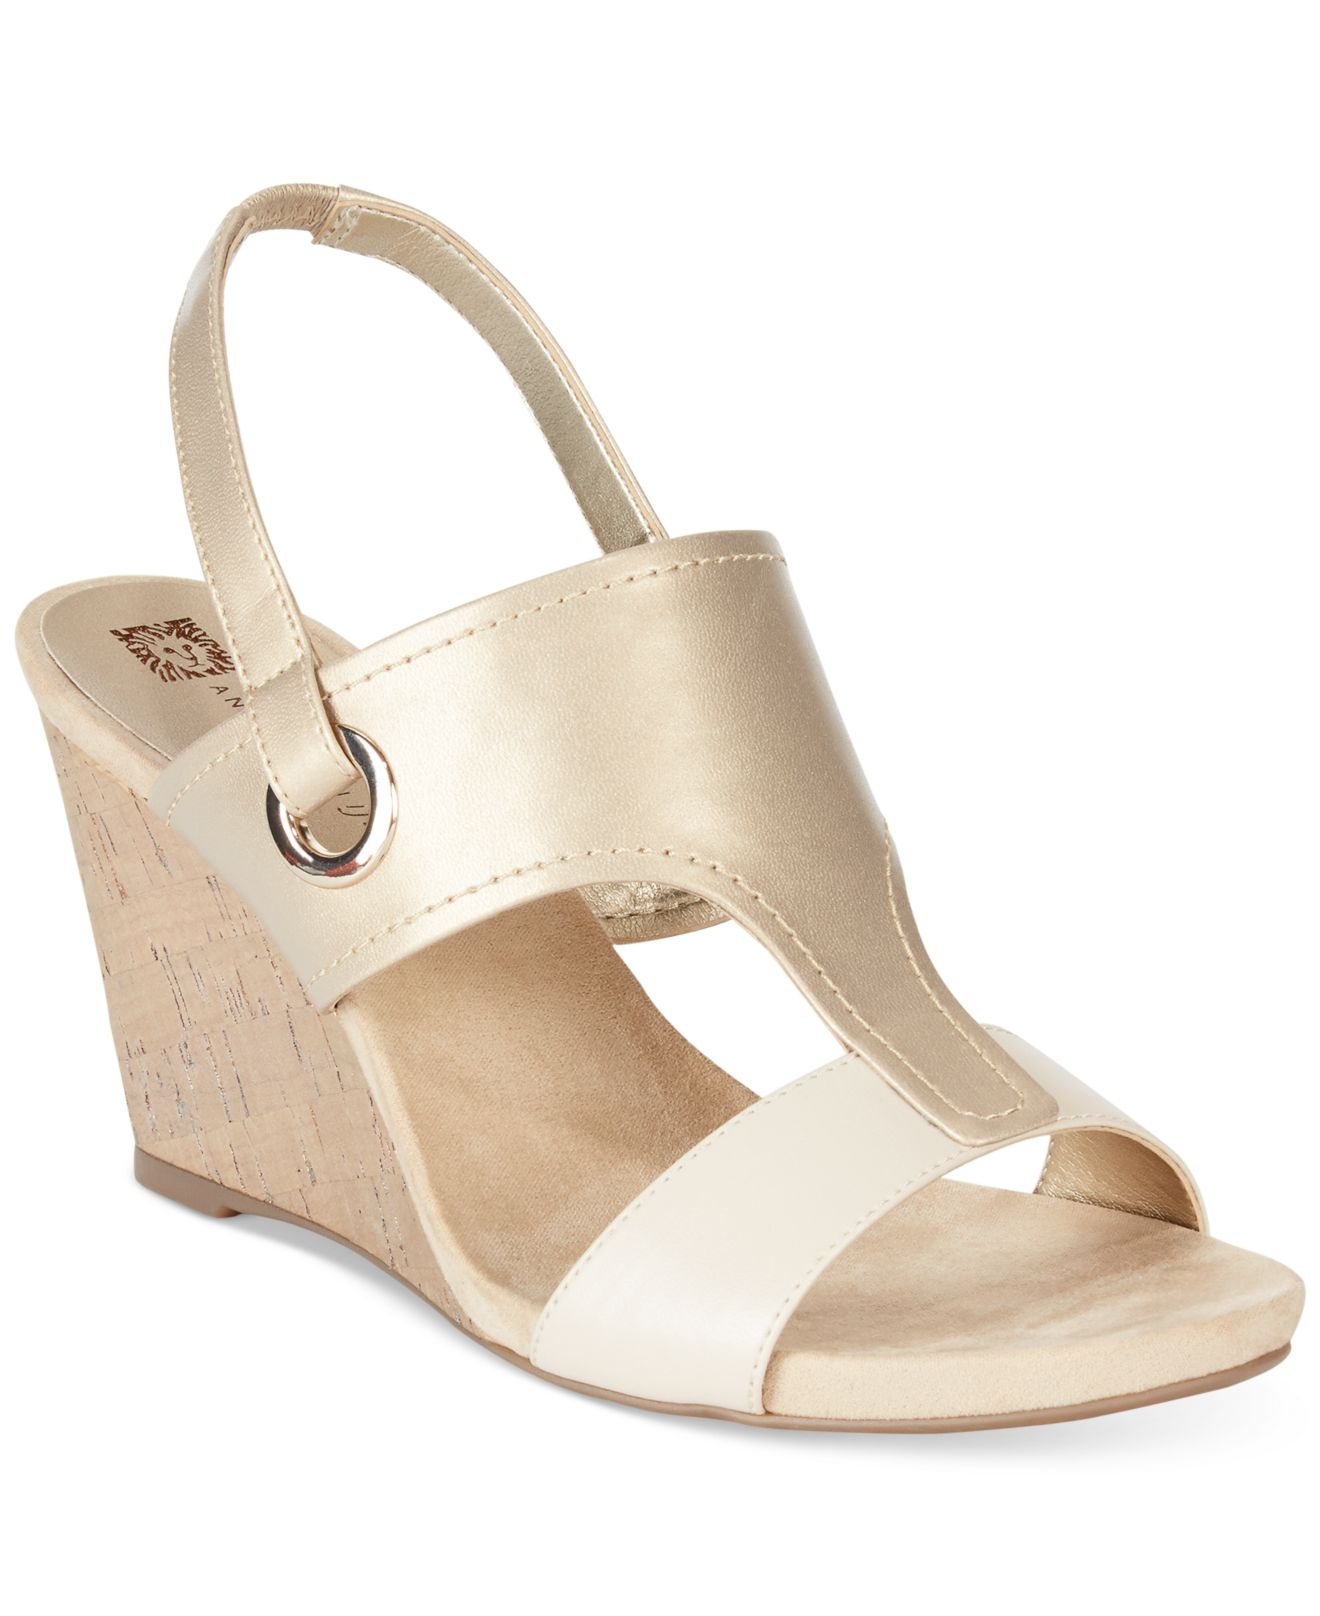 Anne Klein Leni Wedge Sandals In Natural Lyst